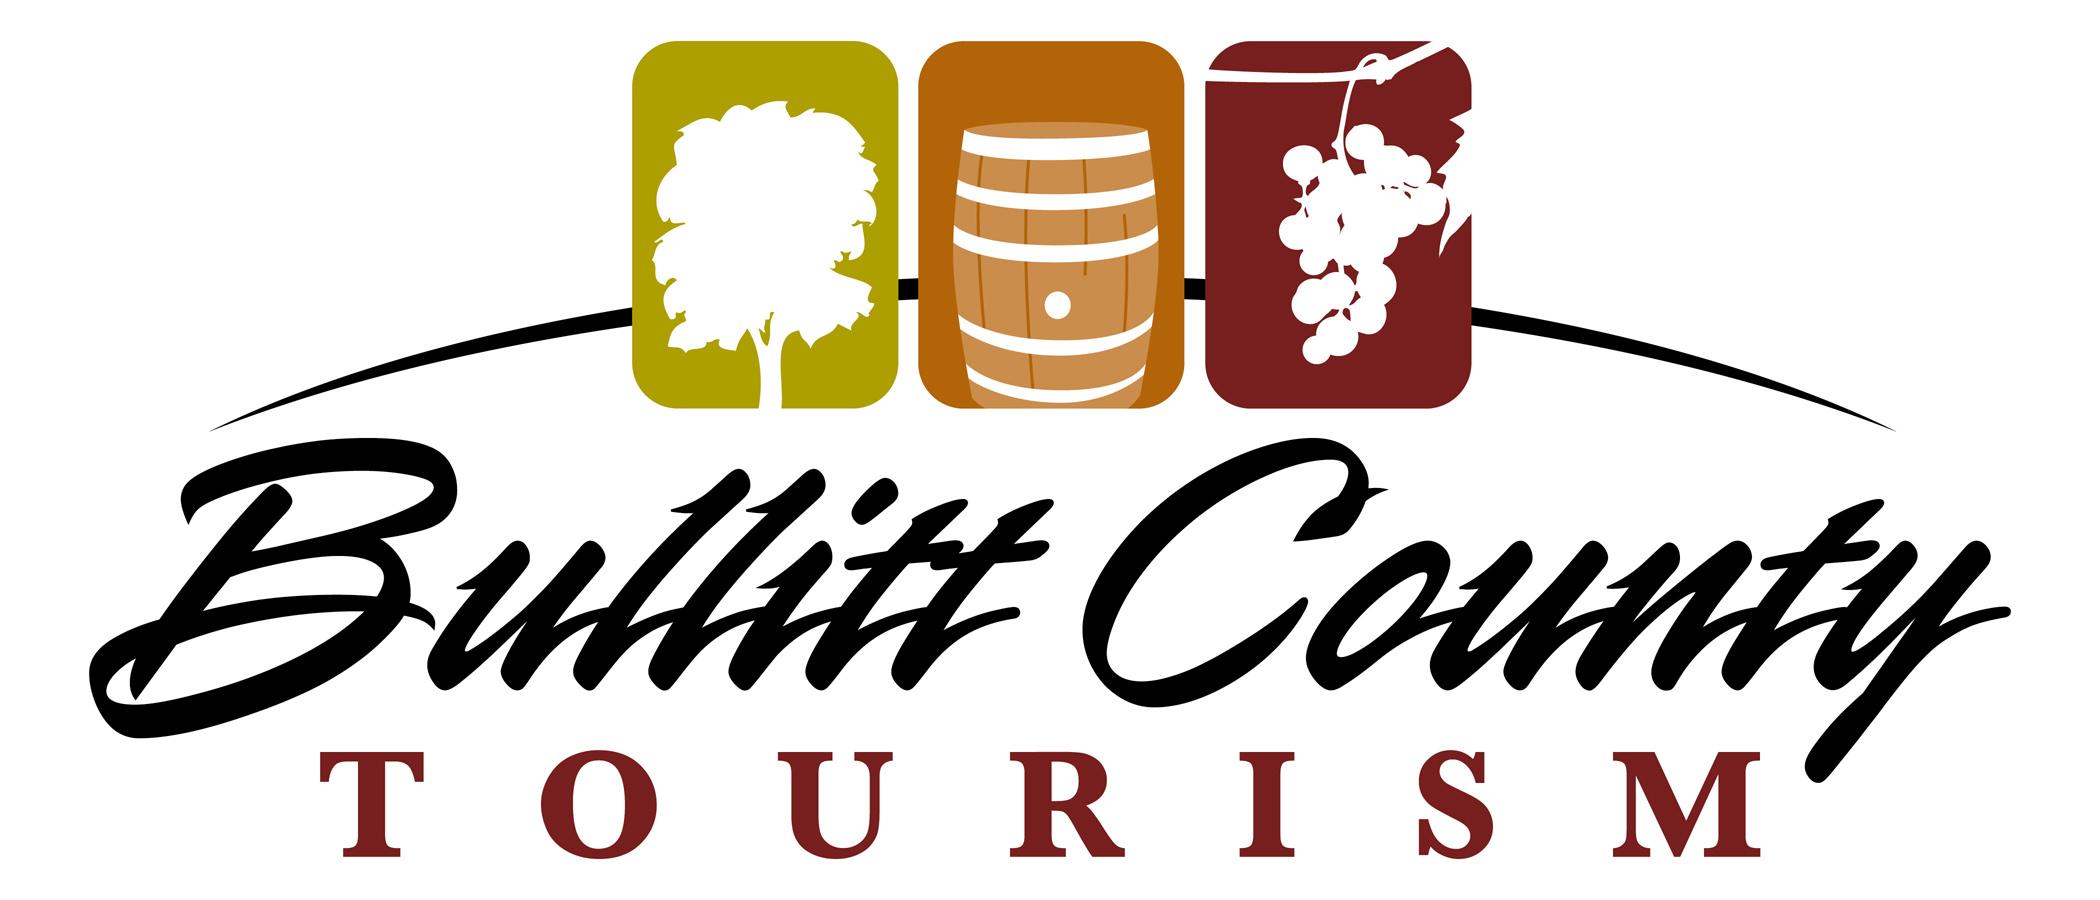 Bullitt County Tourism